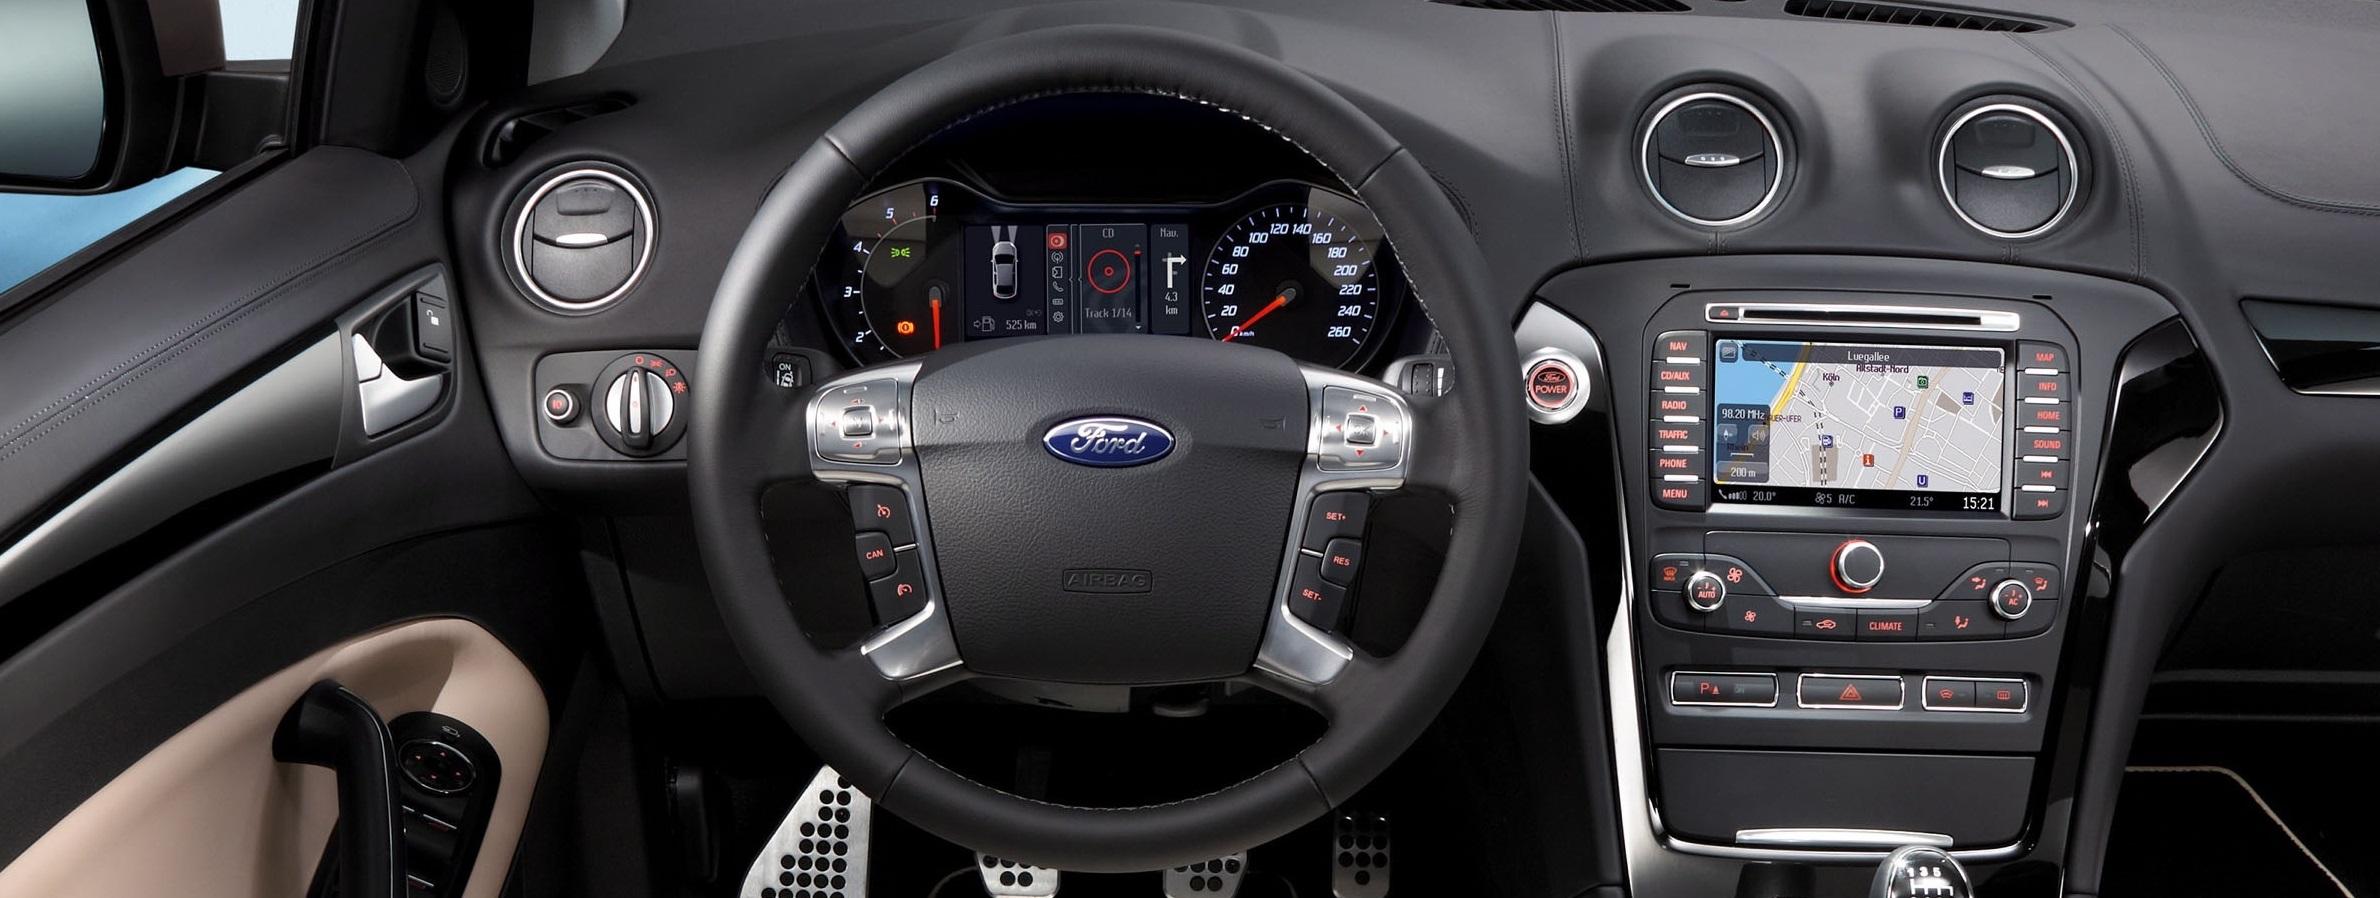 ford-smax-interior-7